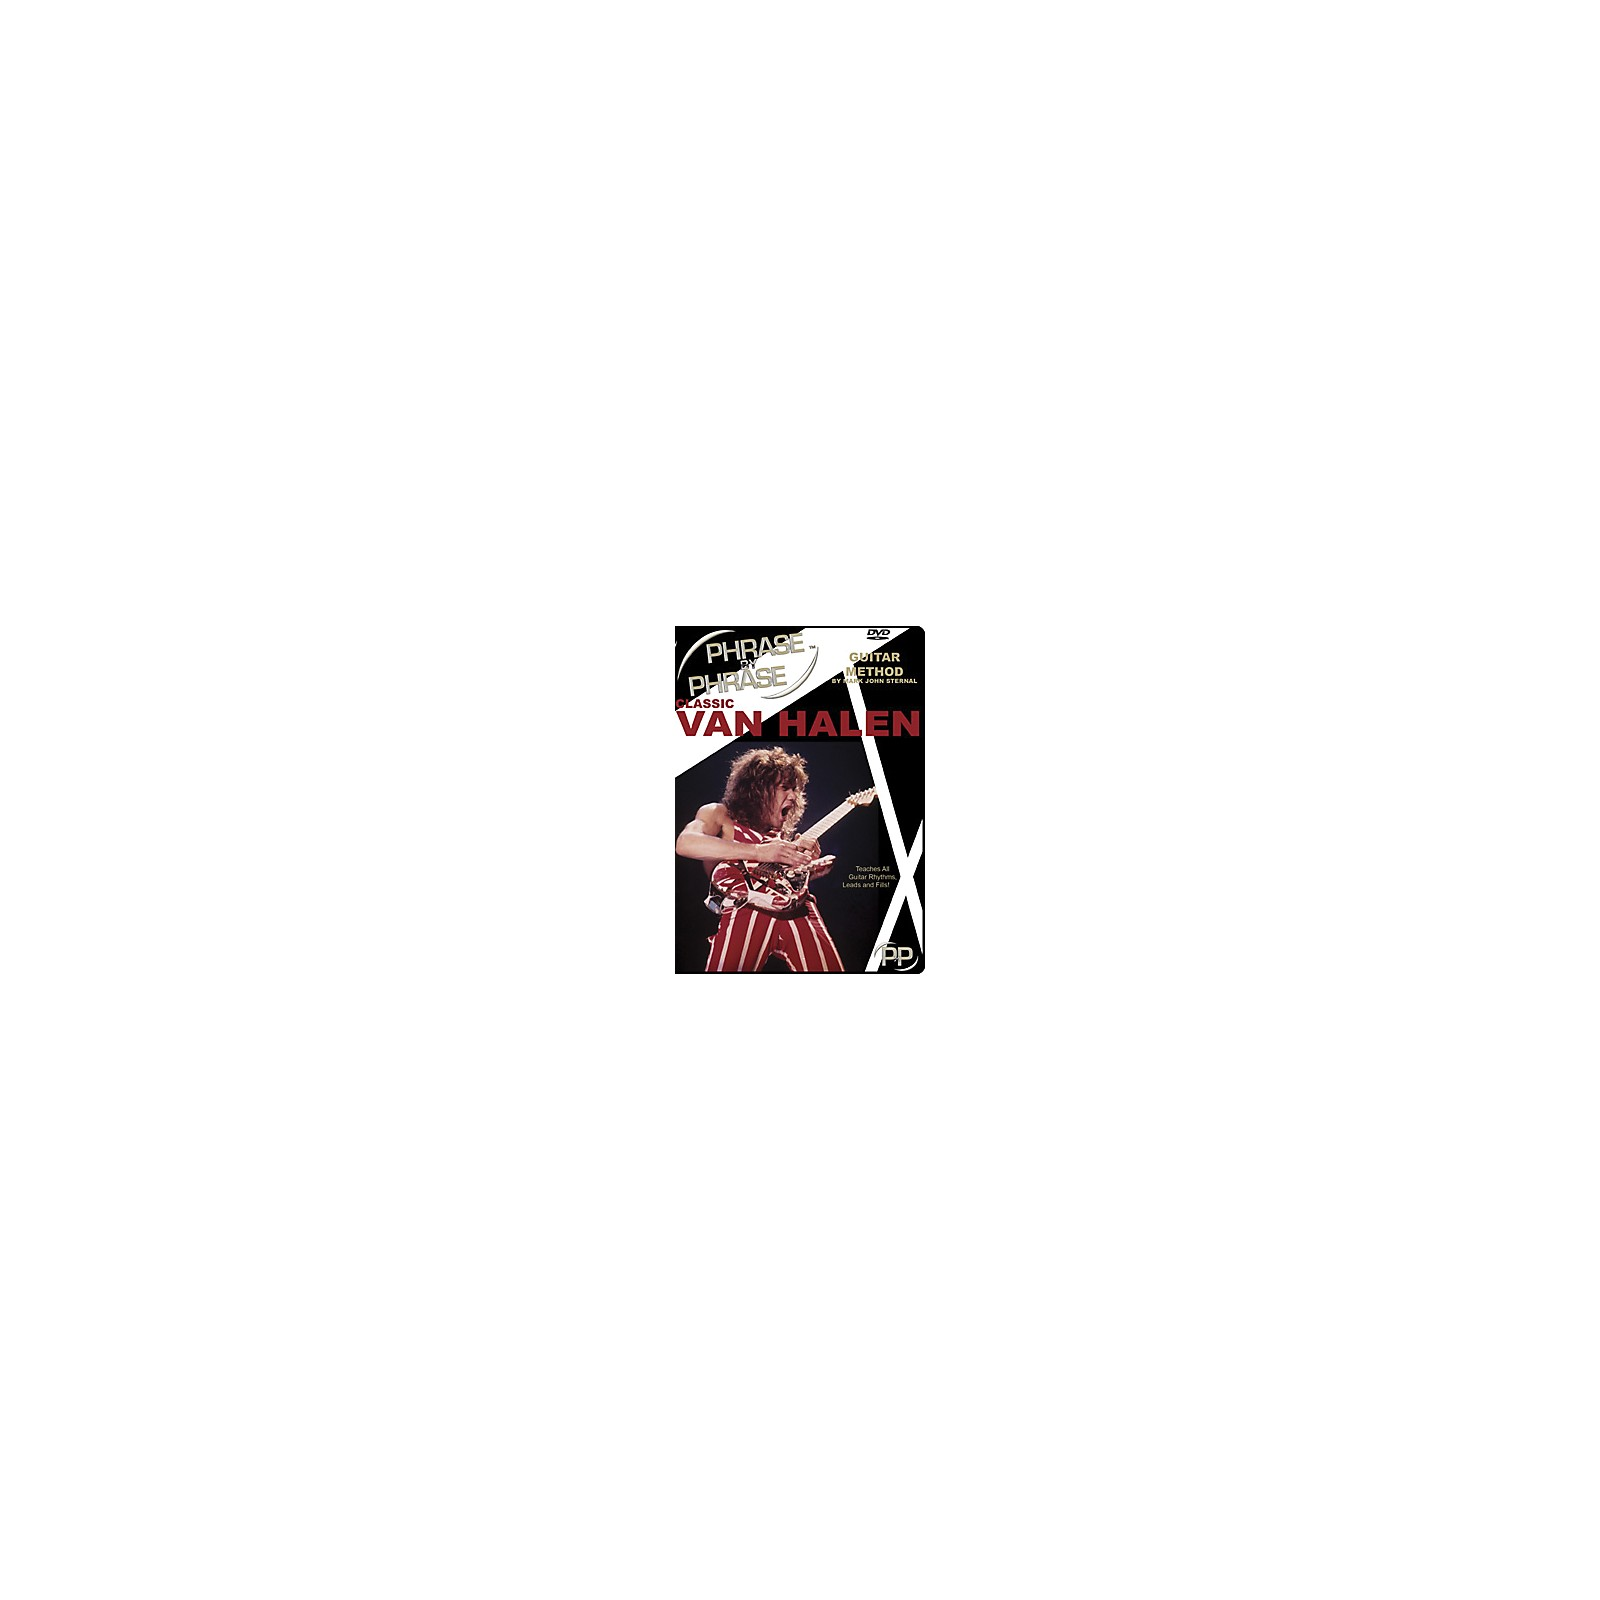 MJS Music Publications Classic Van Halen Phrase by Phrase Guitar Method (DVD)